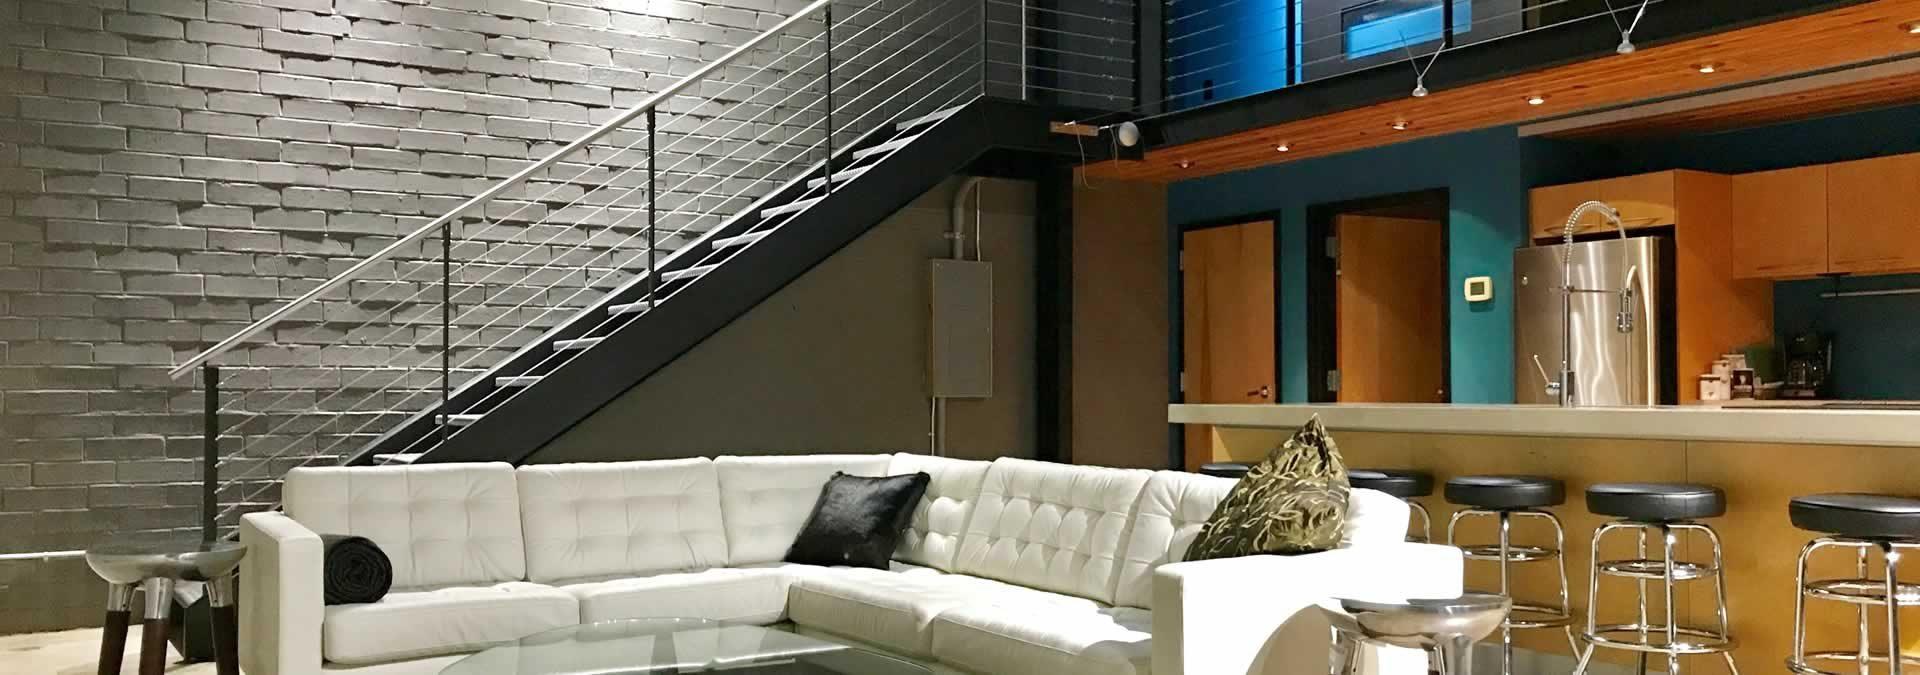 boutique designer hotels hangar lofts hotel columbia sc. Black Bedroom Furniture Sets. Home Design Ideas